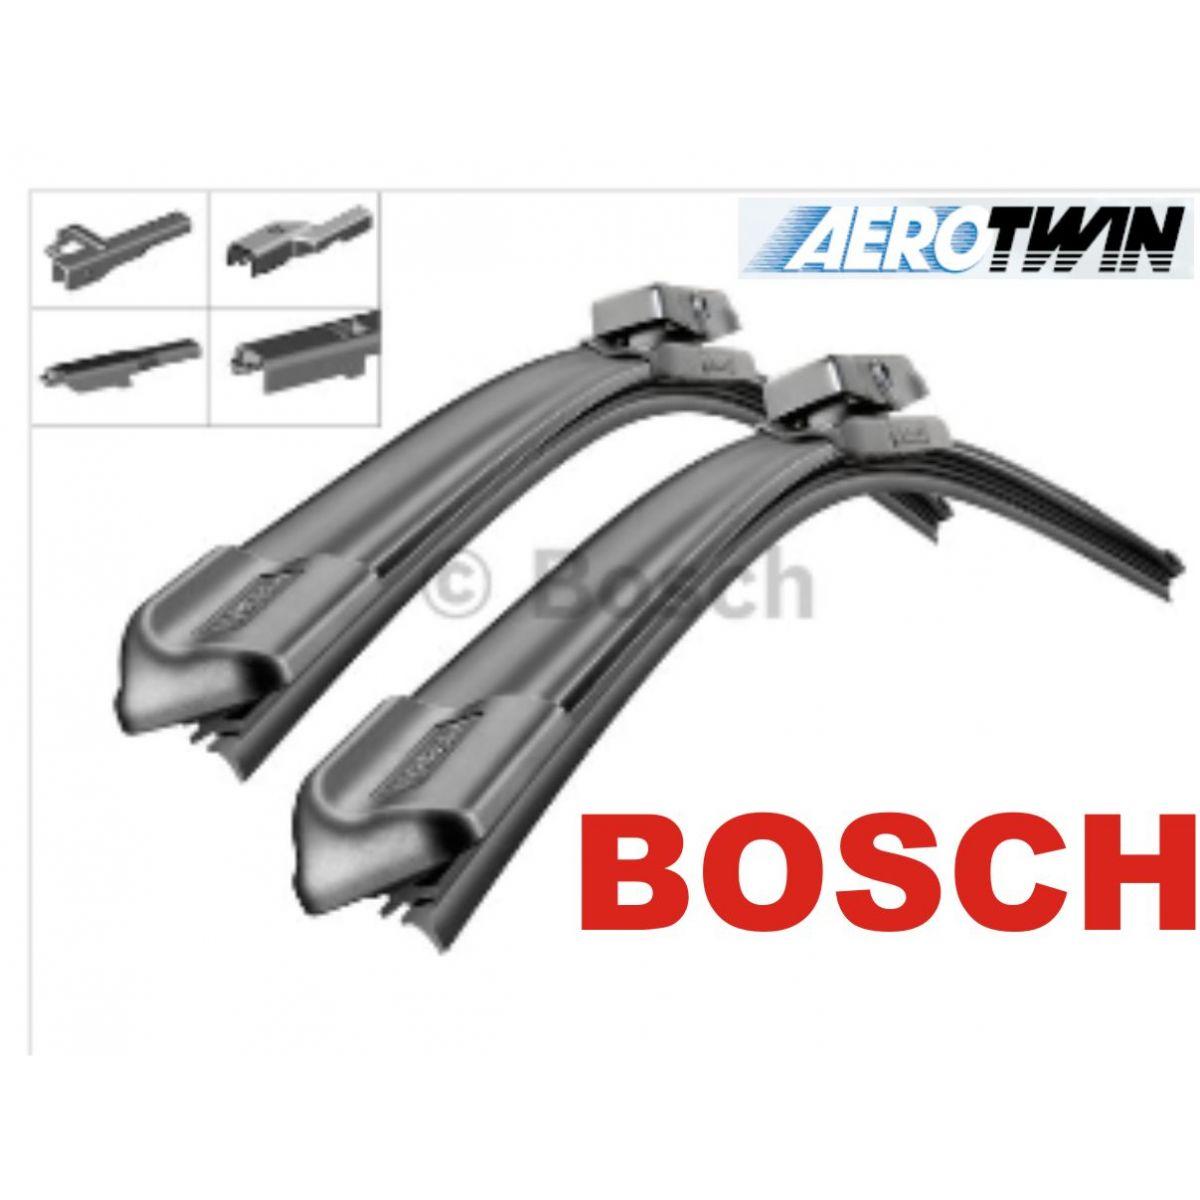 Palheta Bosch Aerotwin Plus Limpador de para brisa Bosch PEUGEOT 307 CC